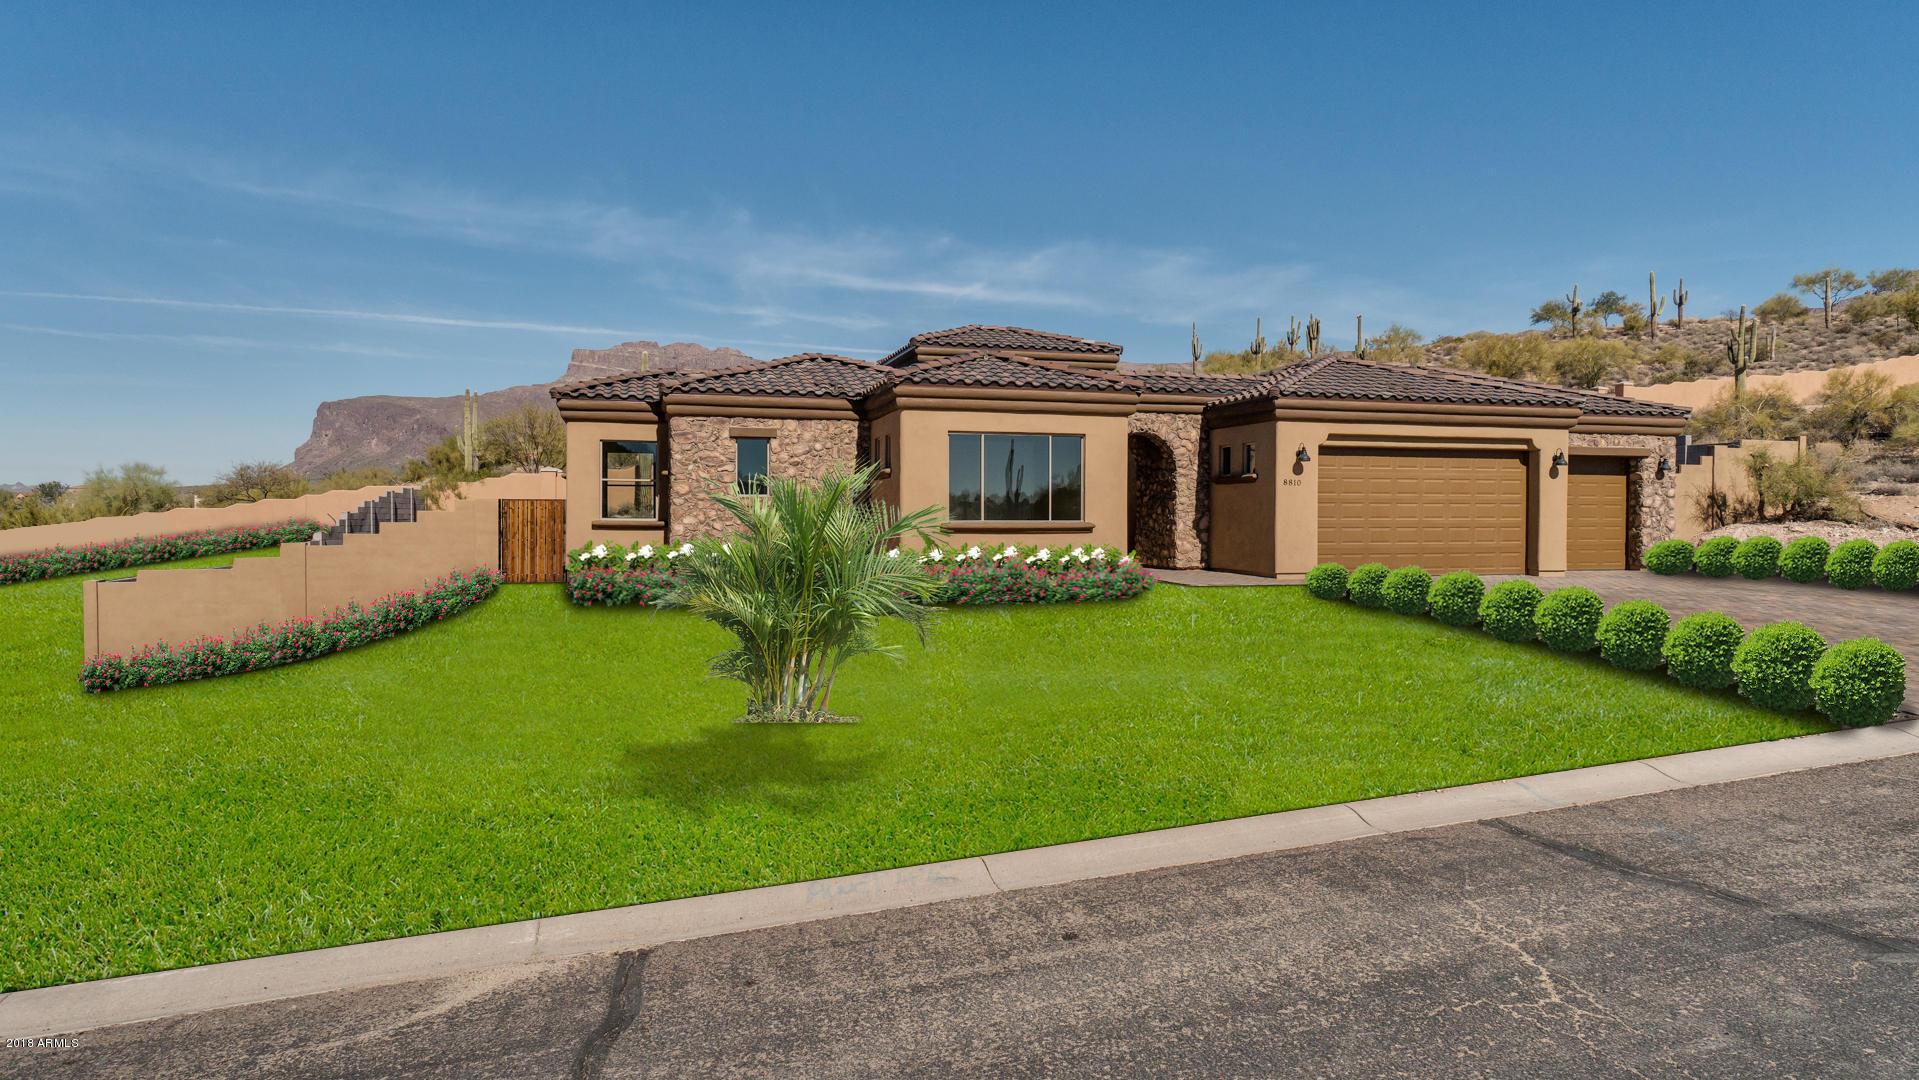 MLS 5724243 8810 E CANYON VISTA Drive, Gold Canyon, AZ 85118 Gold Canyon AZ Superstition Foothills